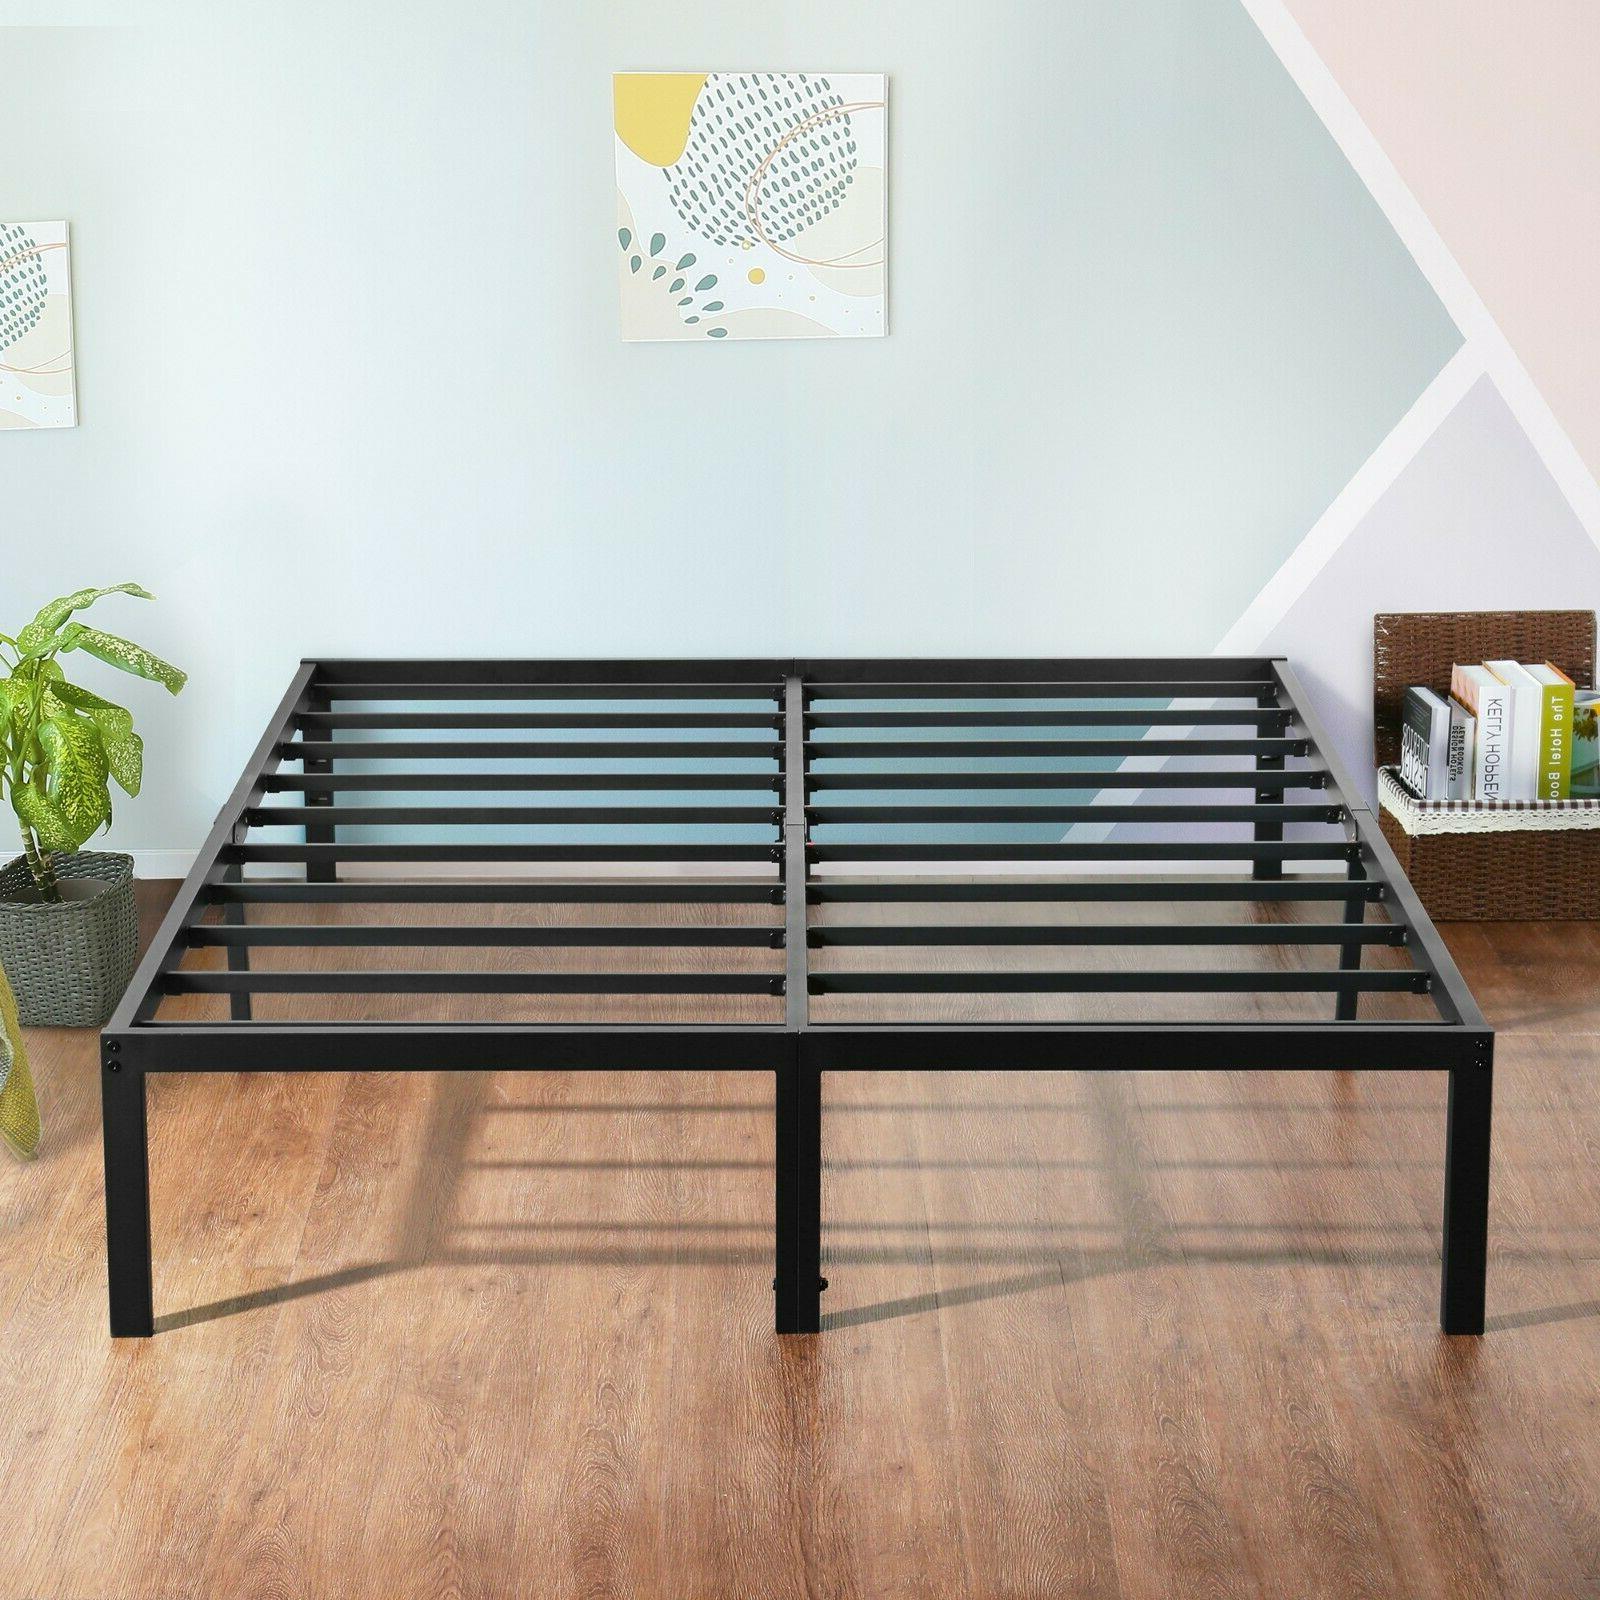 18 tall metal slat platform foundation bed